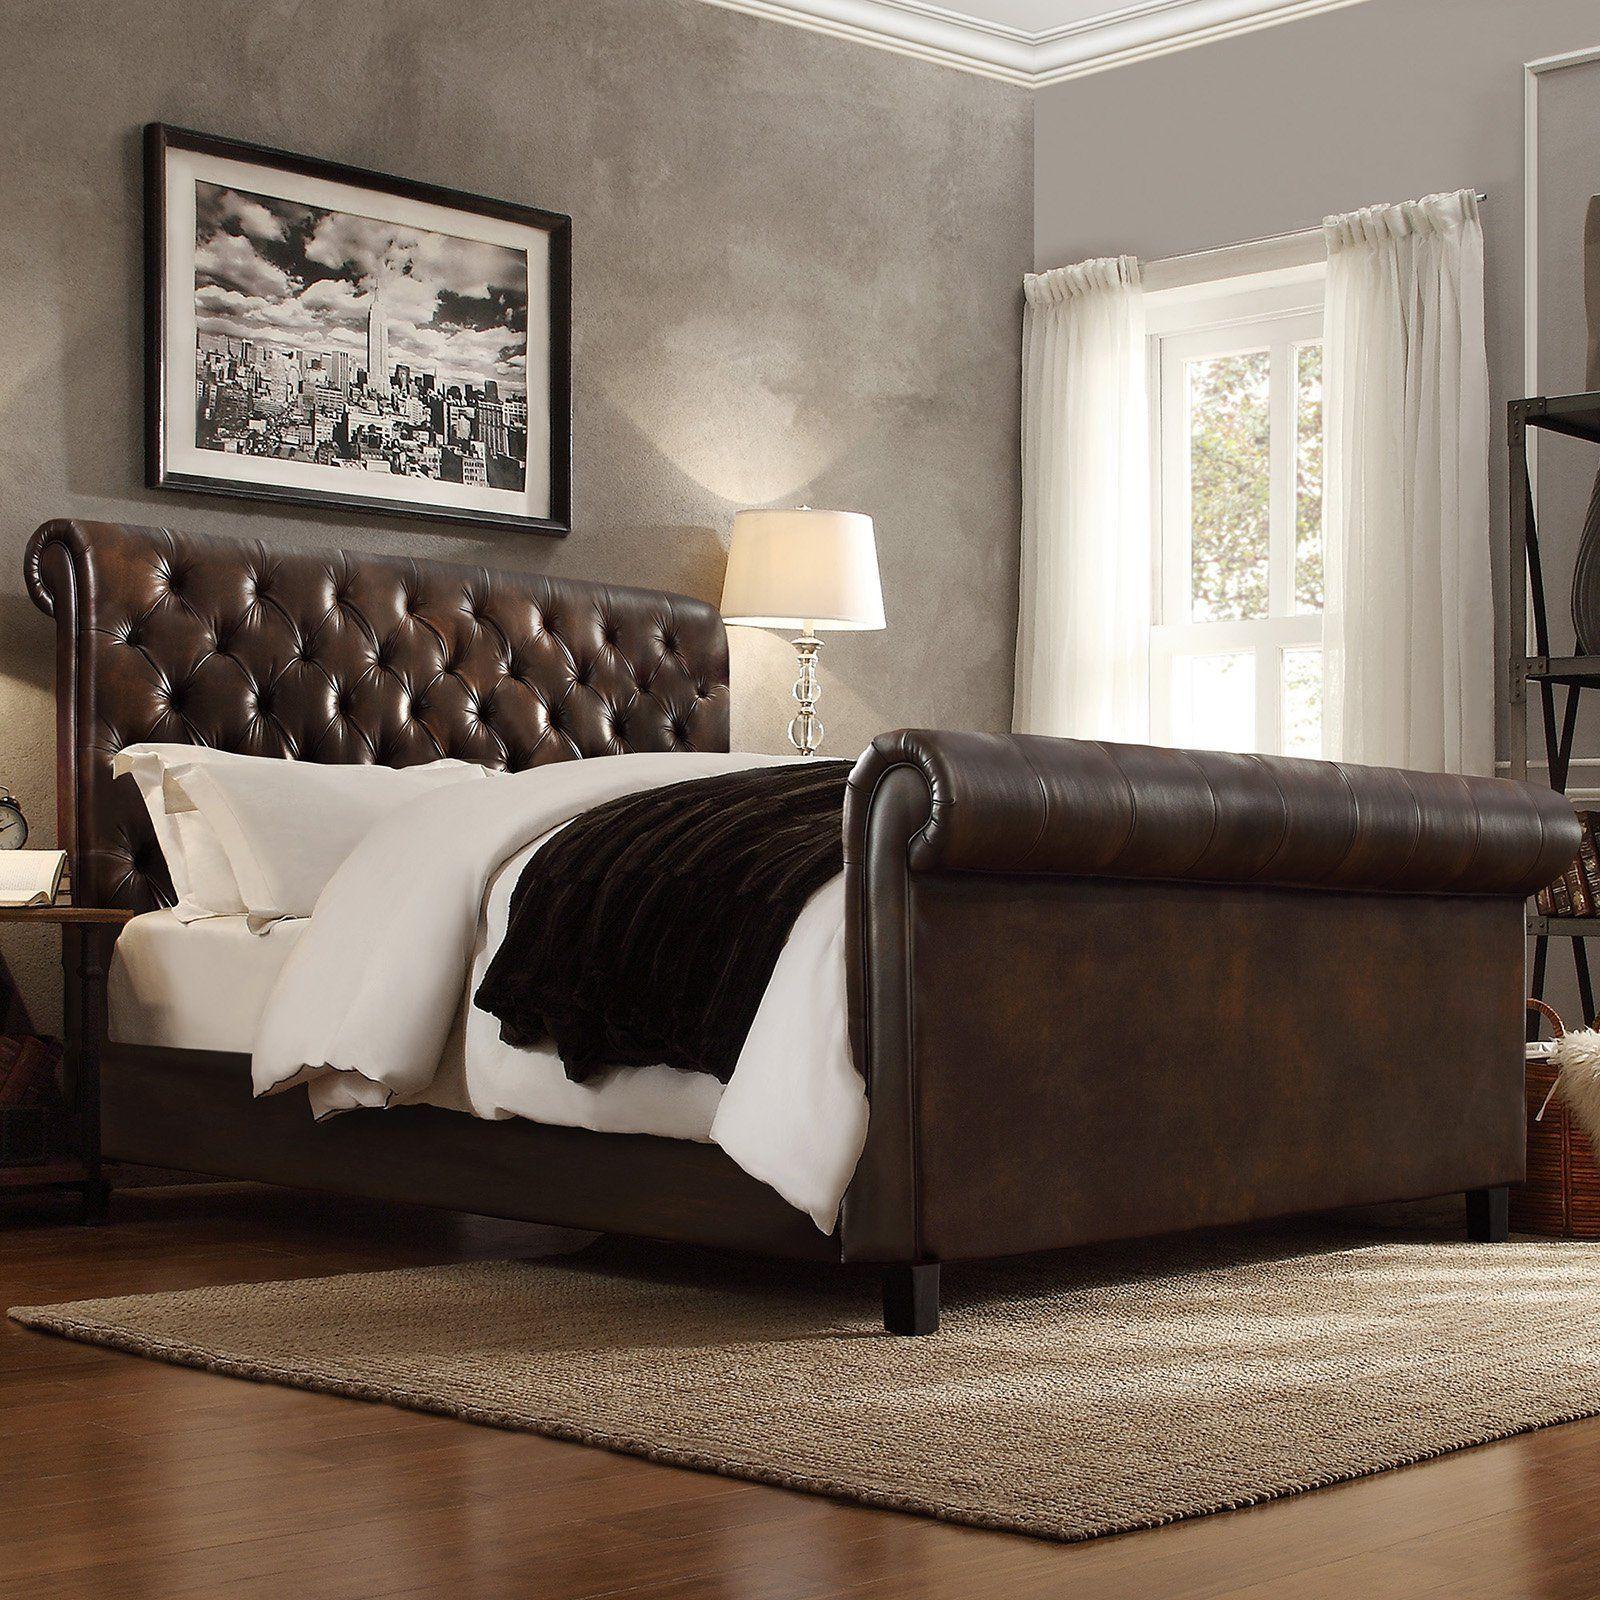 Homelegance Dartford Upholstered Faux Leather Sleigh Bed